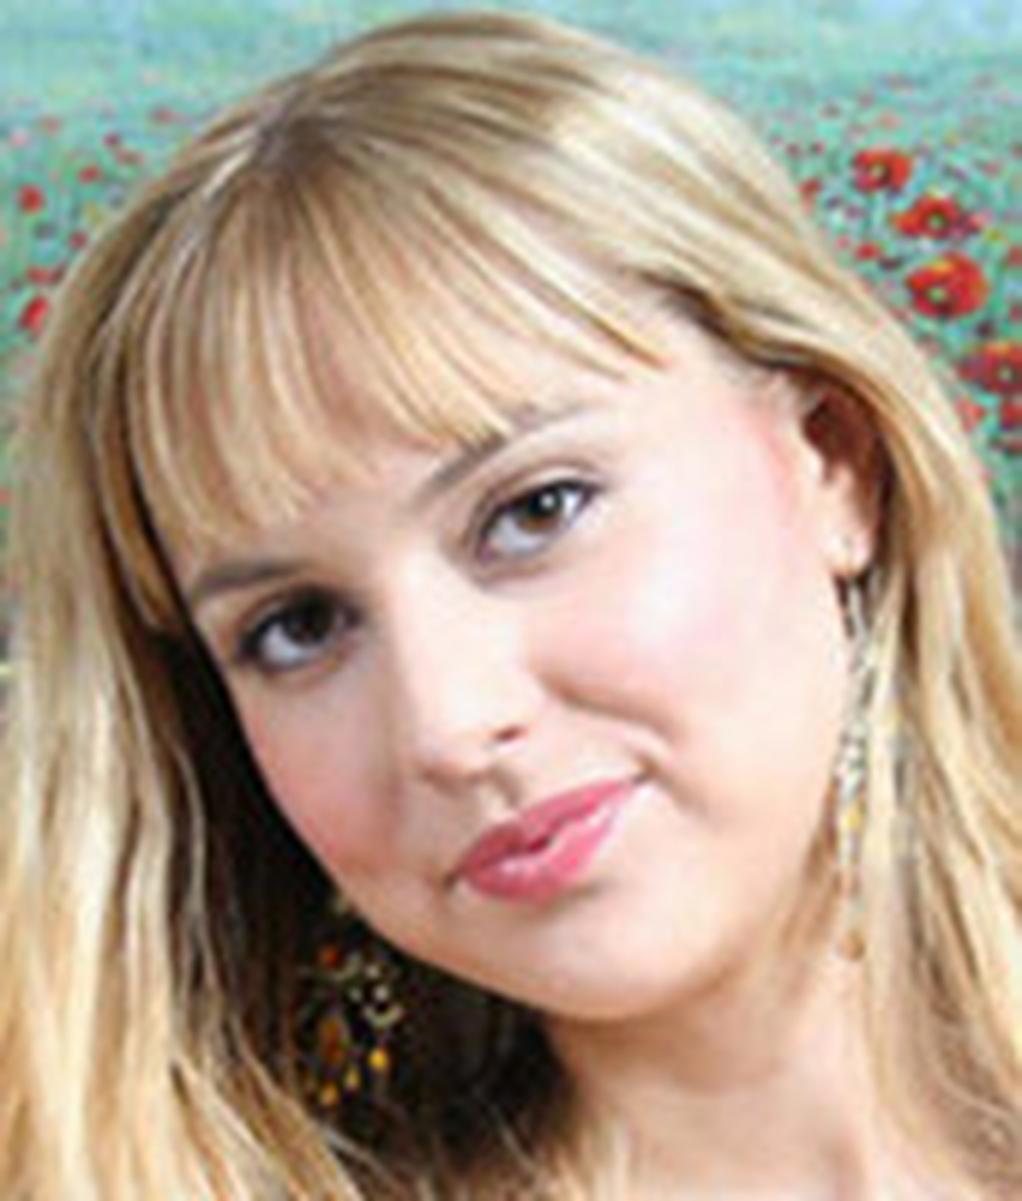 Alexa Andreas Porn alexa andreas wiki & bio - pornographic actress